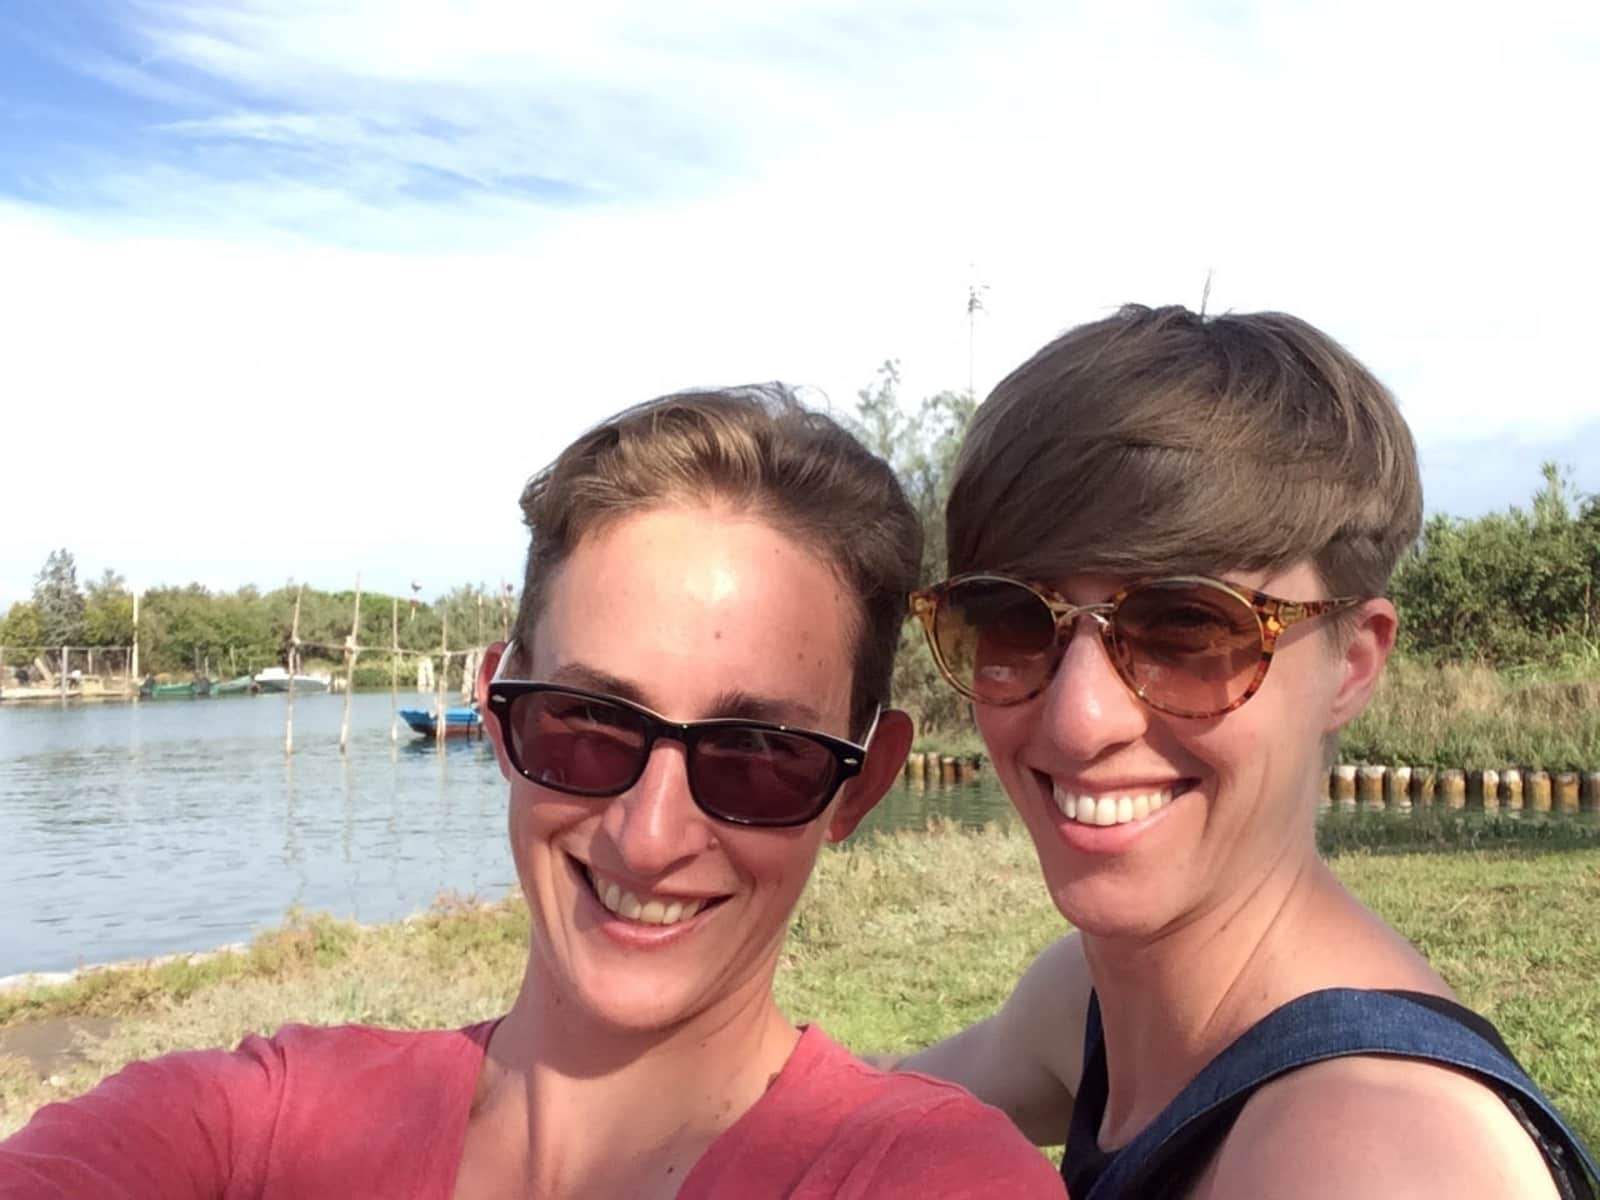 Ingrid & Nerida from Sydney, New South Wales, Australia